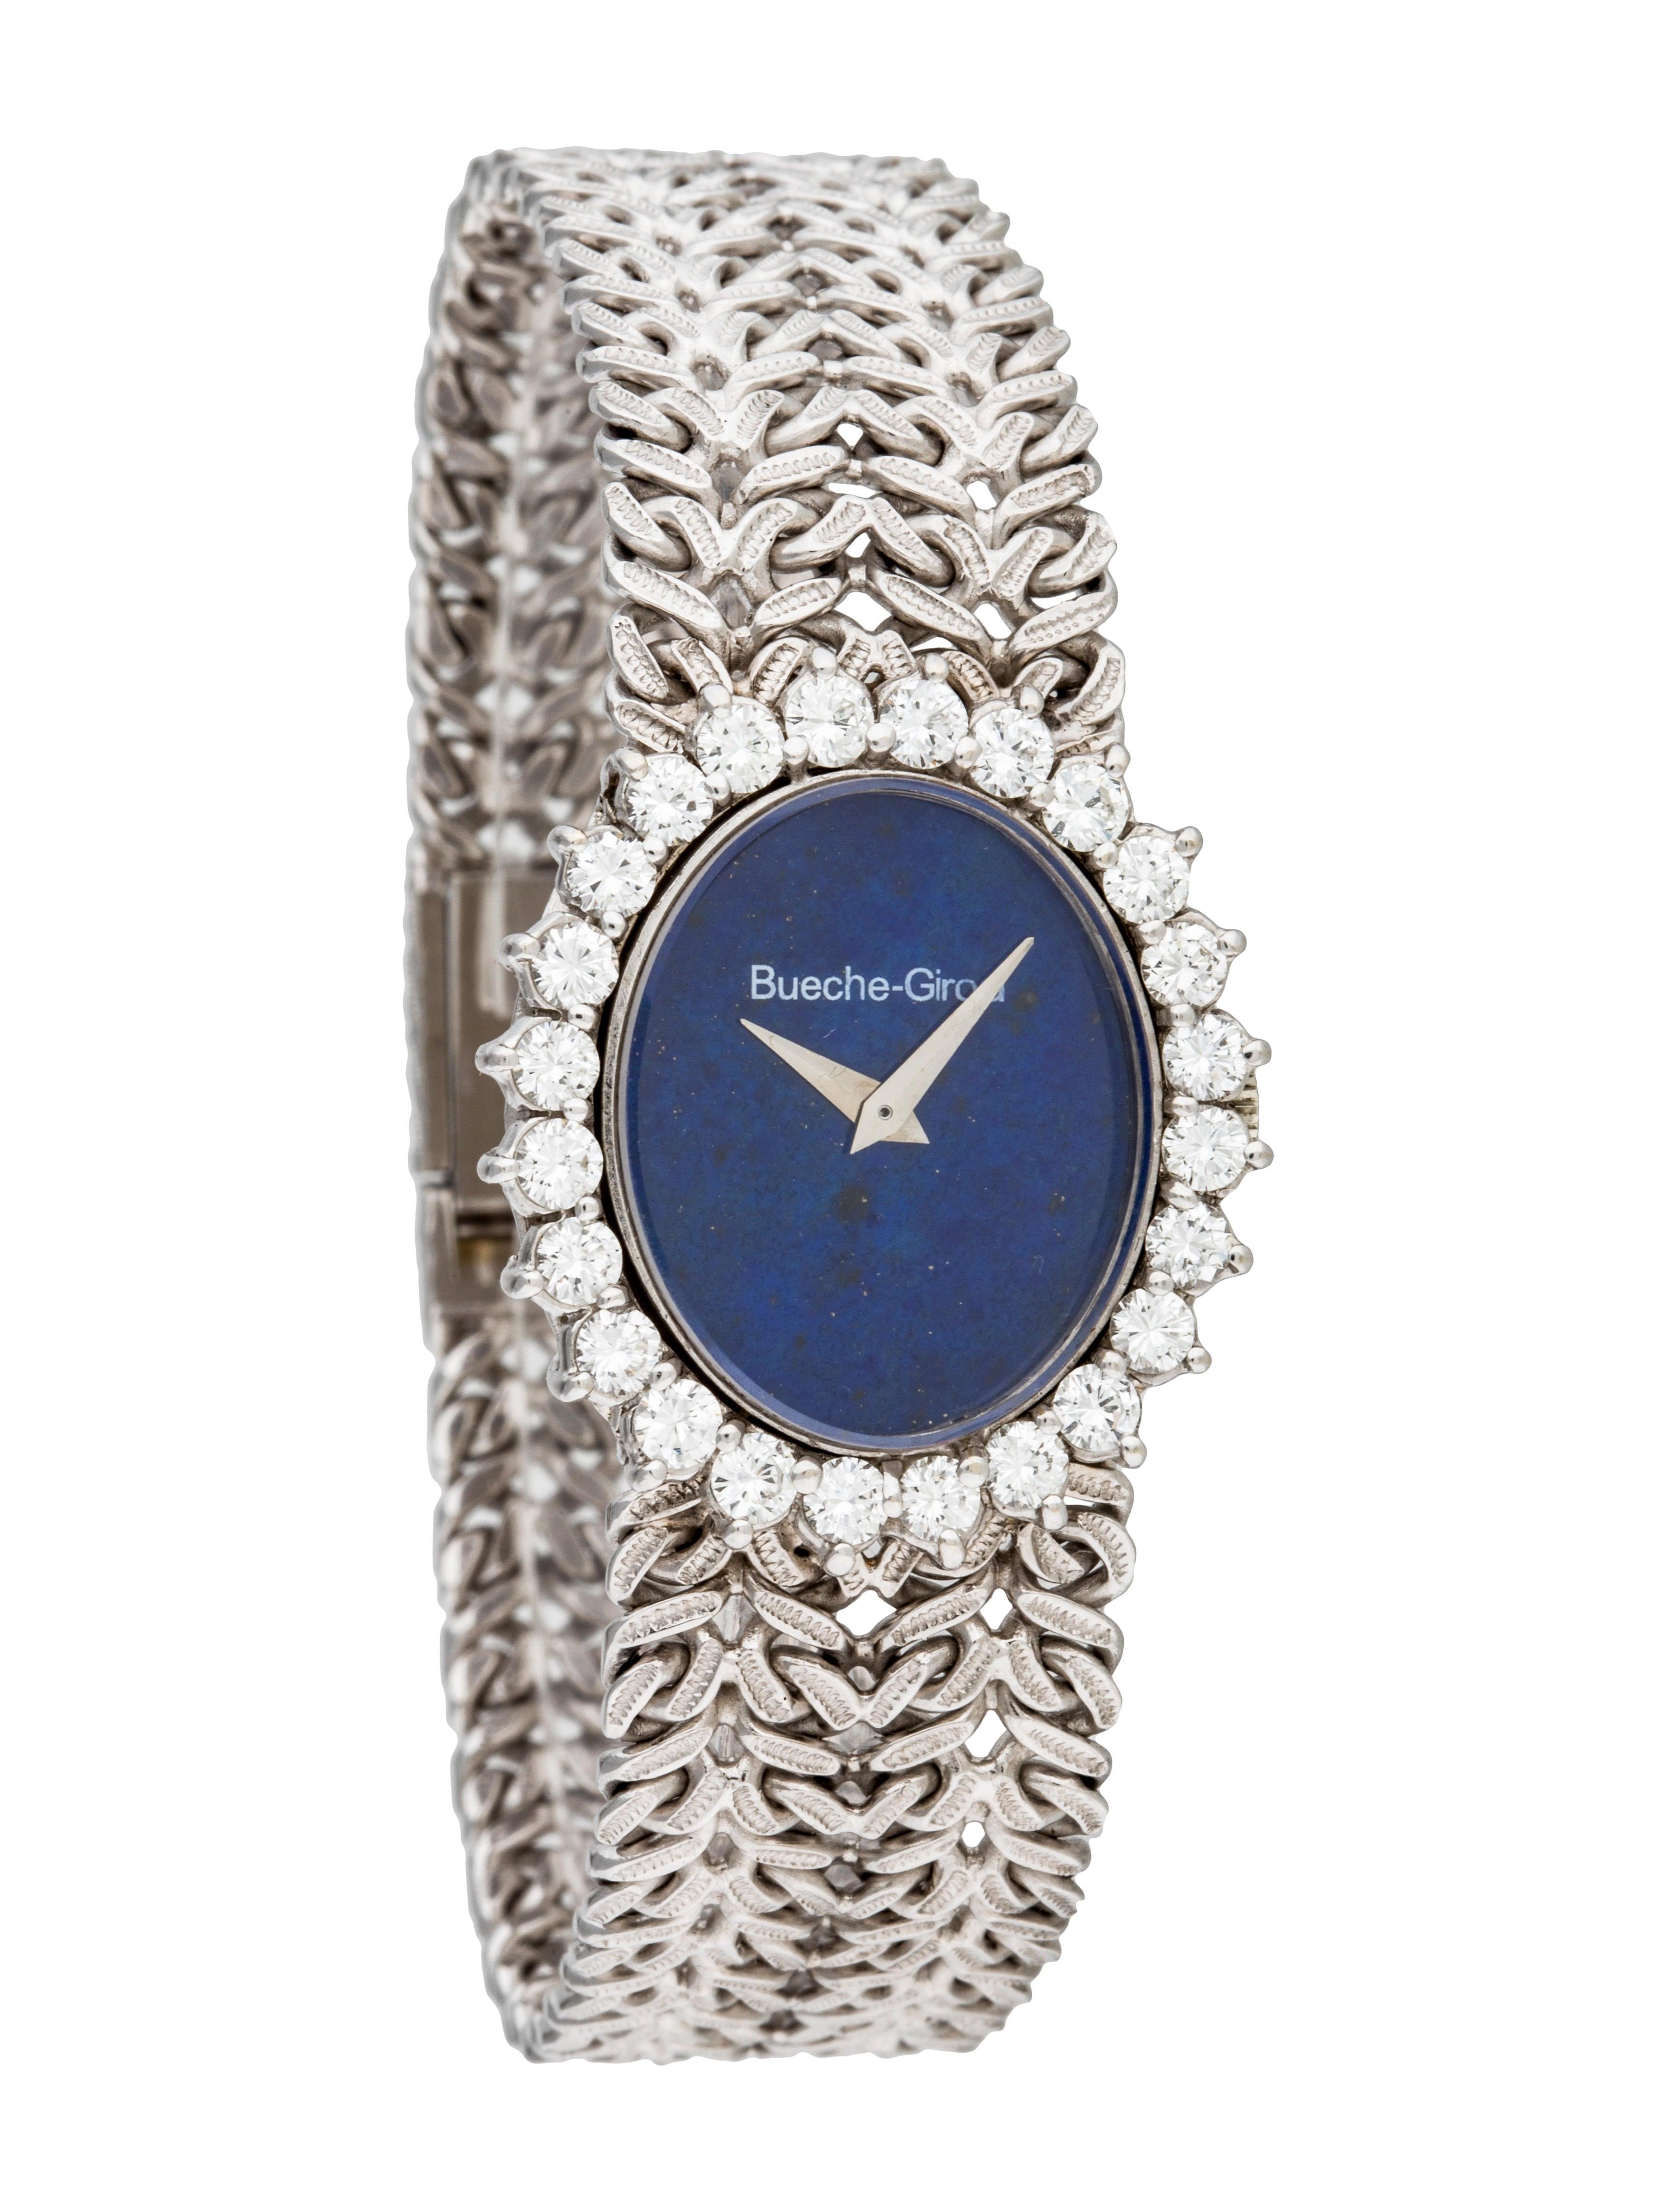 bueche girod vintage timepiece bracelet buy20004 the realreal watches · bracelet bueche girod vintage timepiece vintage timepiece